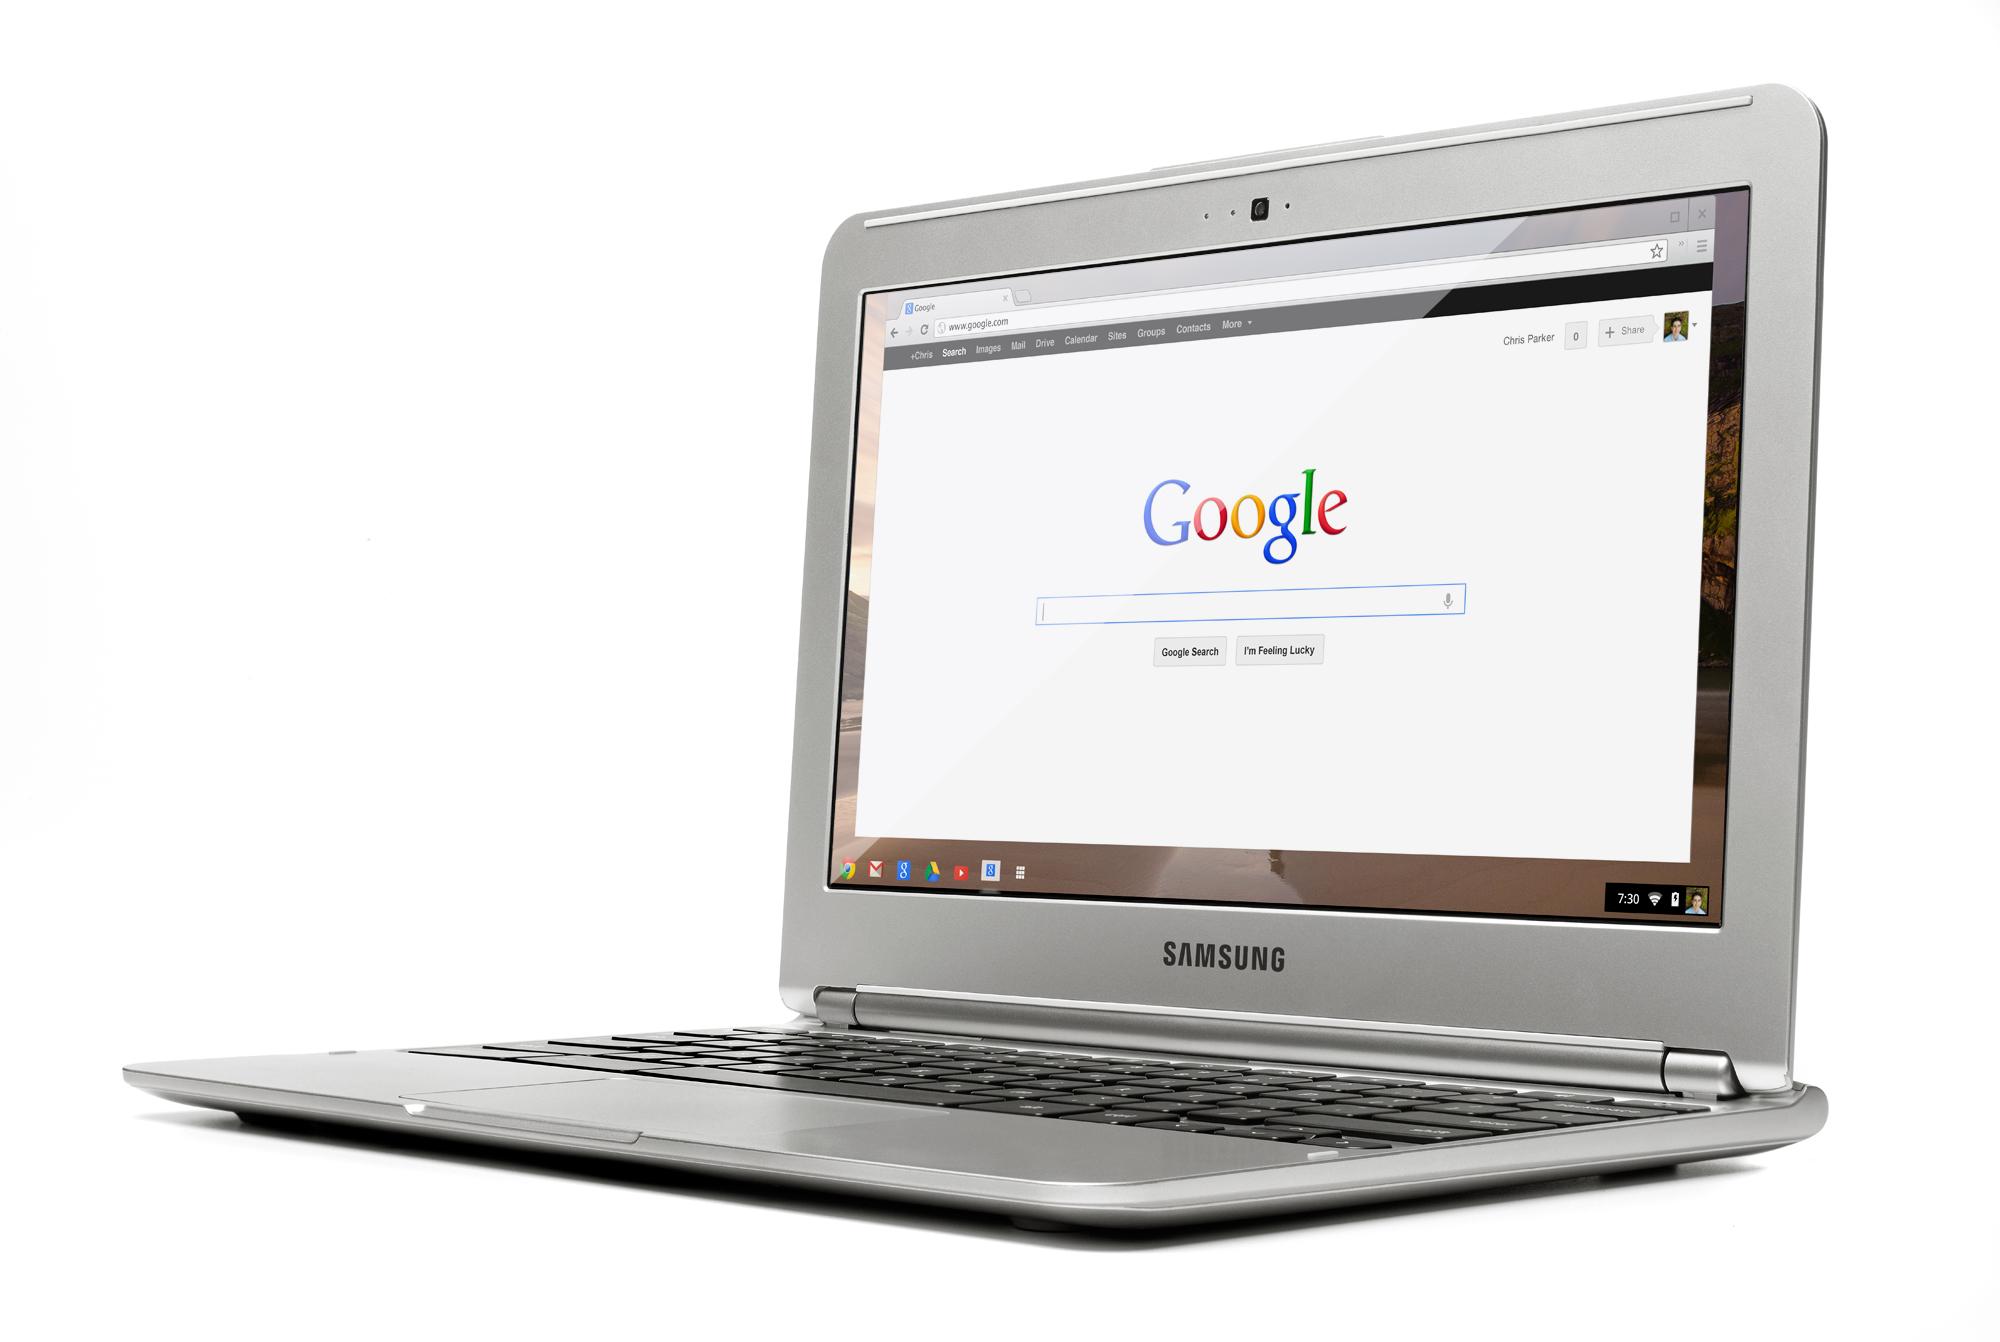 Samsung Chromebook XE303